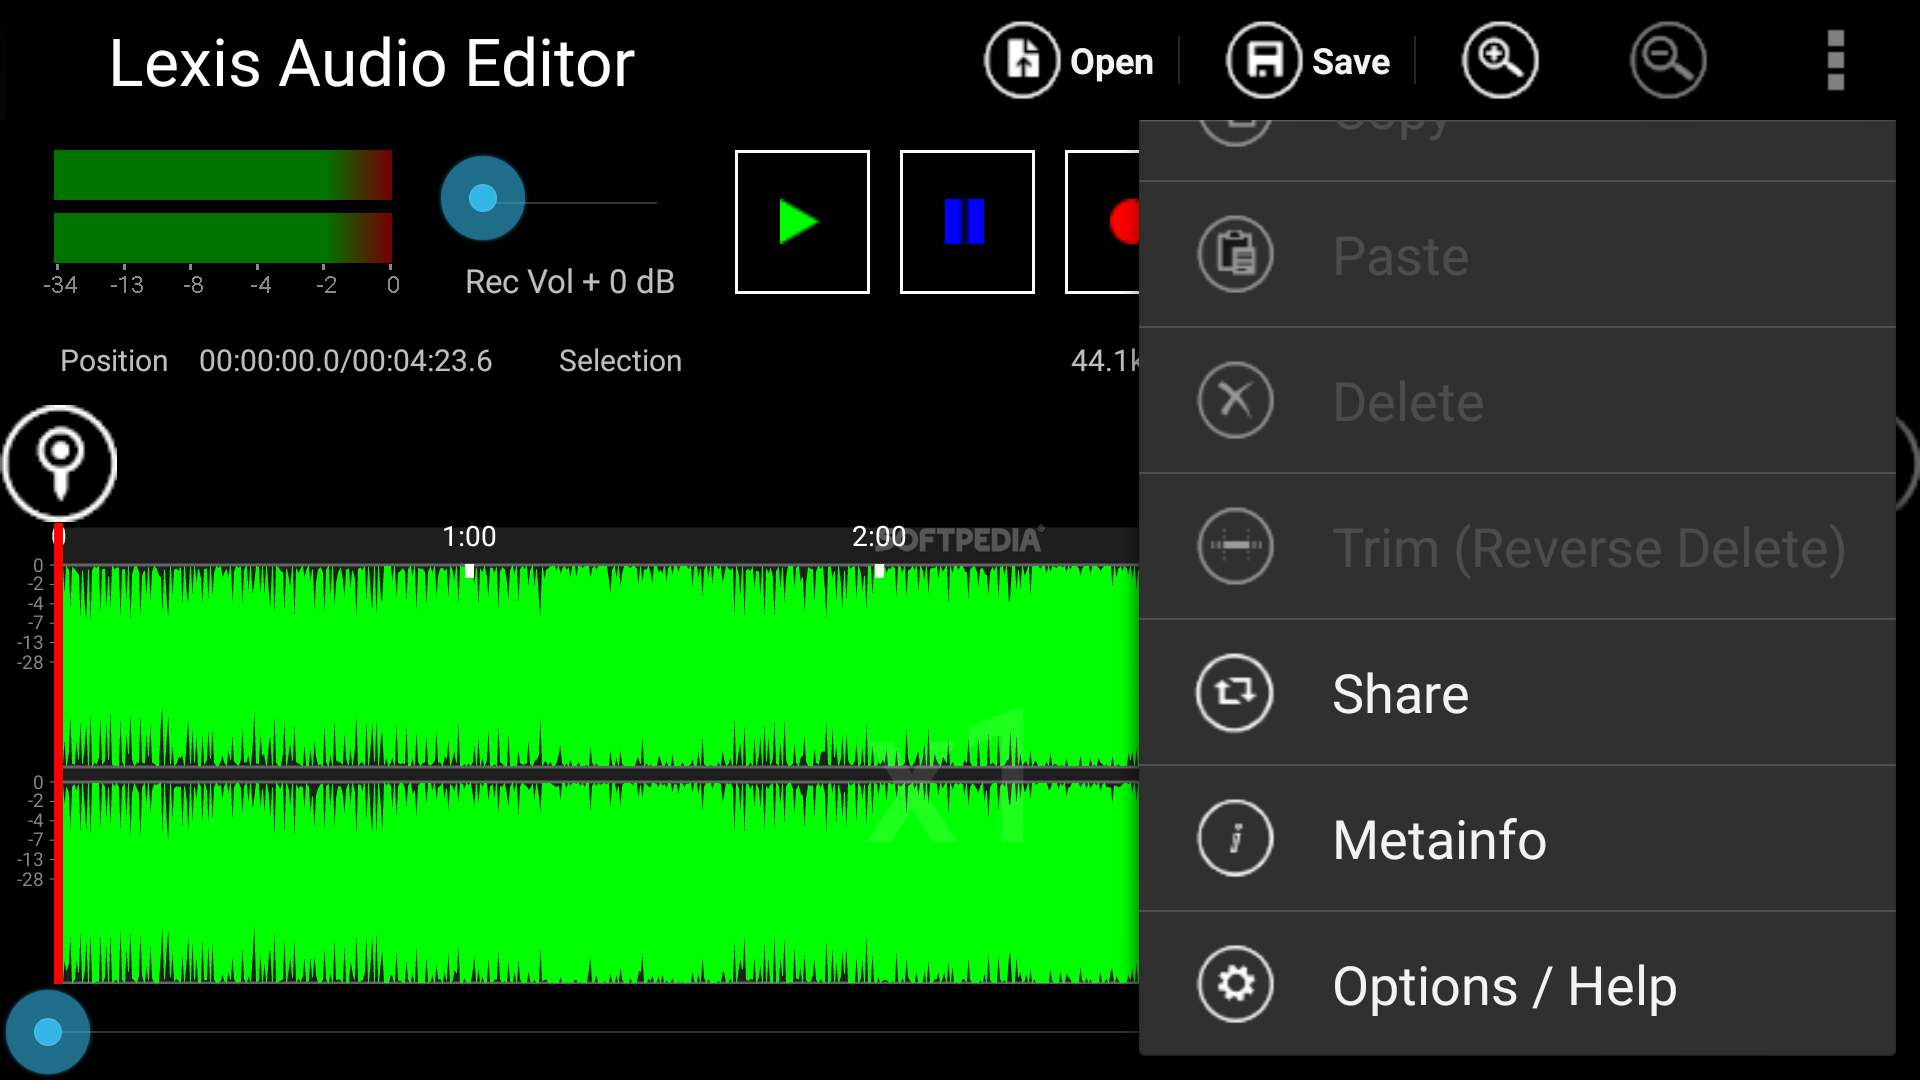 lexis audio editor pro apk 2018